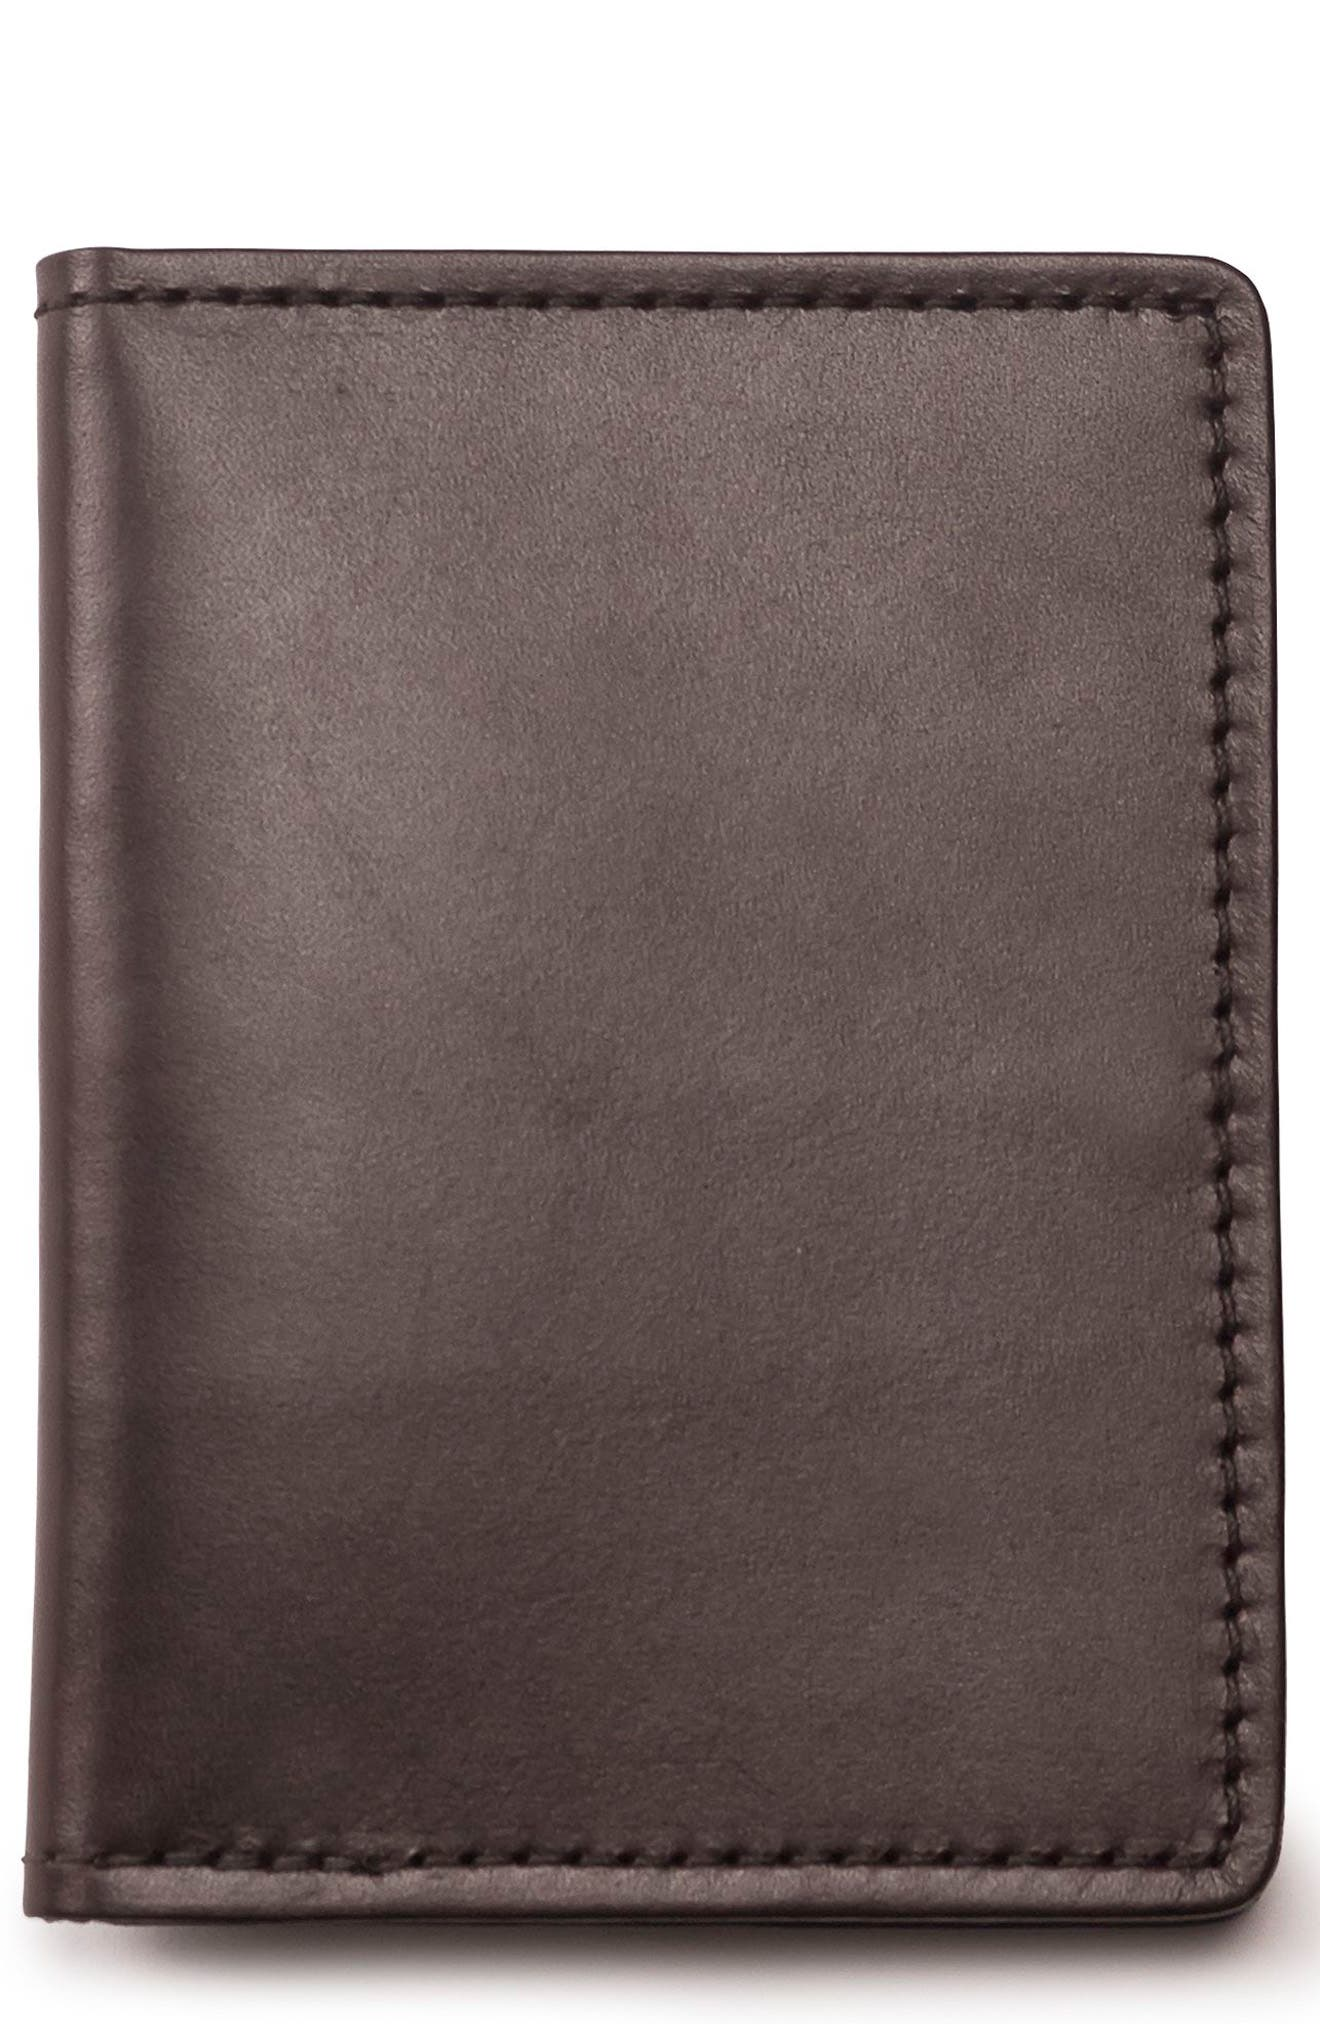 Filson Leather Passport Case